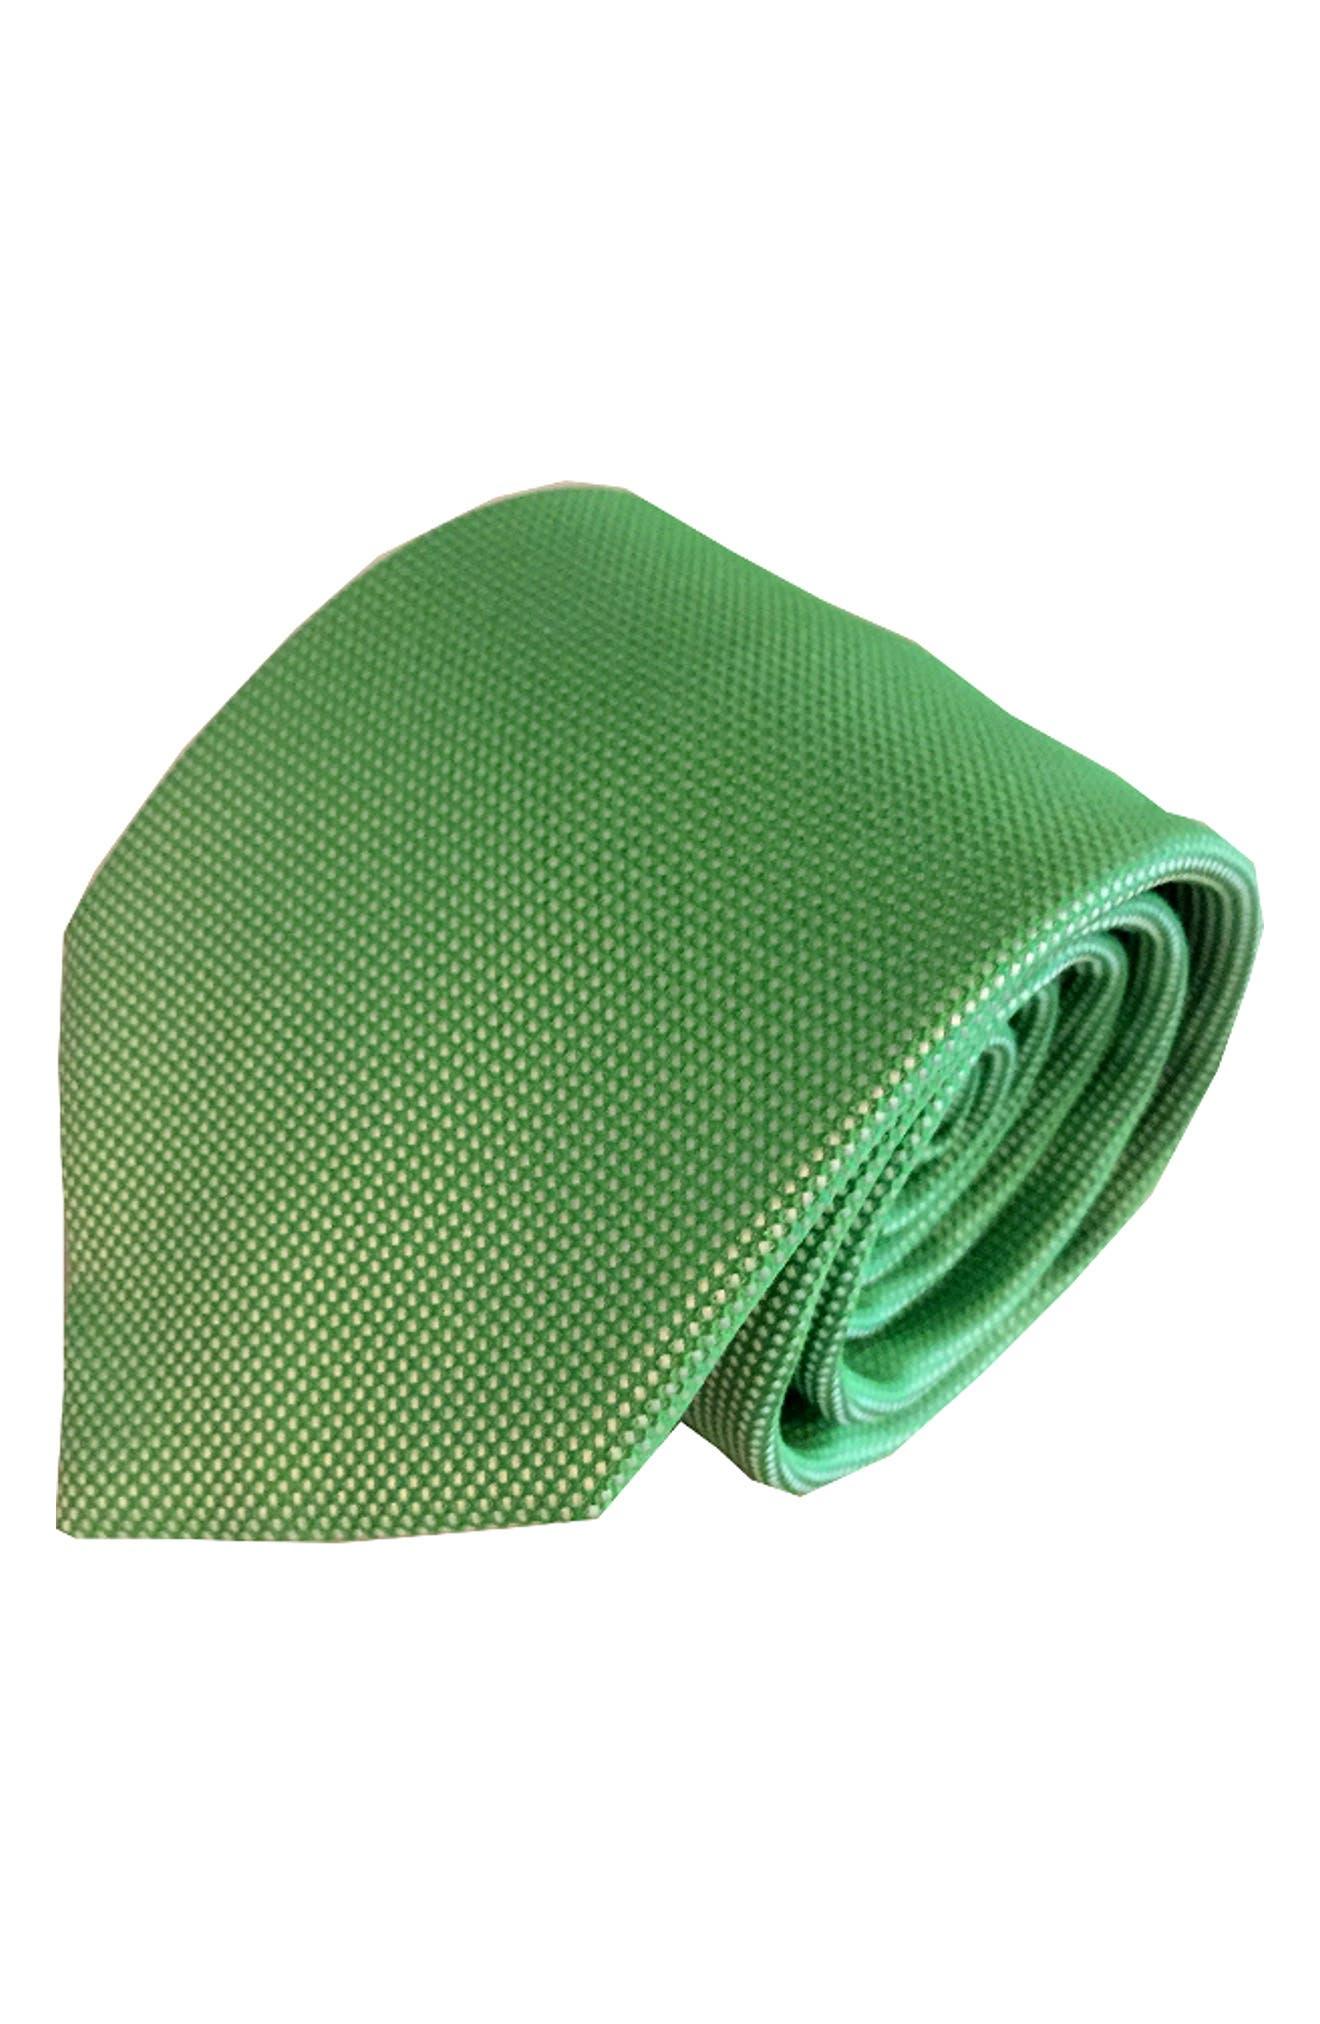 Mullet Silk Tie,                             Main thumbnail 1, color,                             310